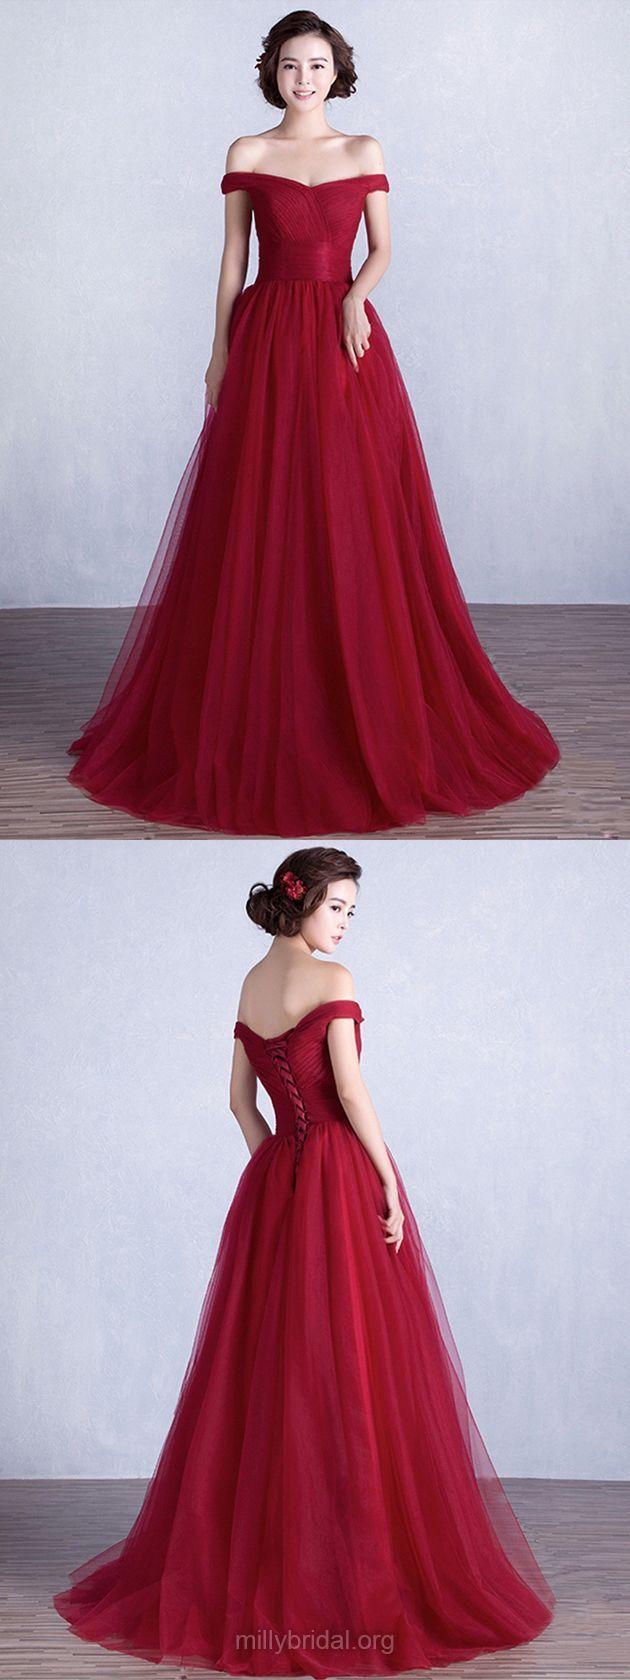 Burgundy prom dresses long prom dresses princess offthe